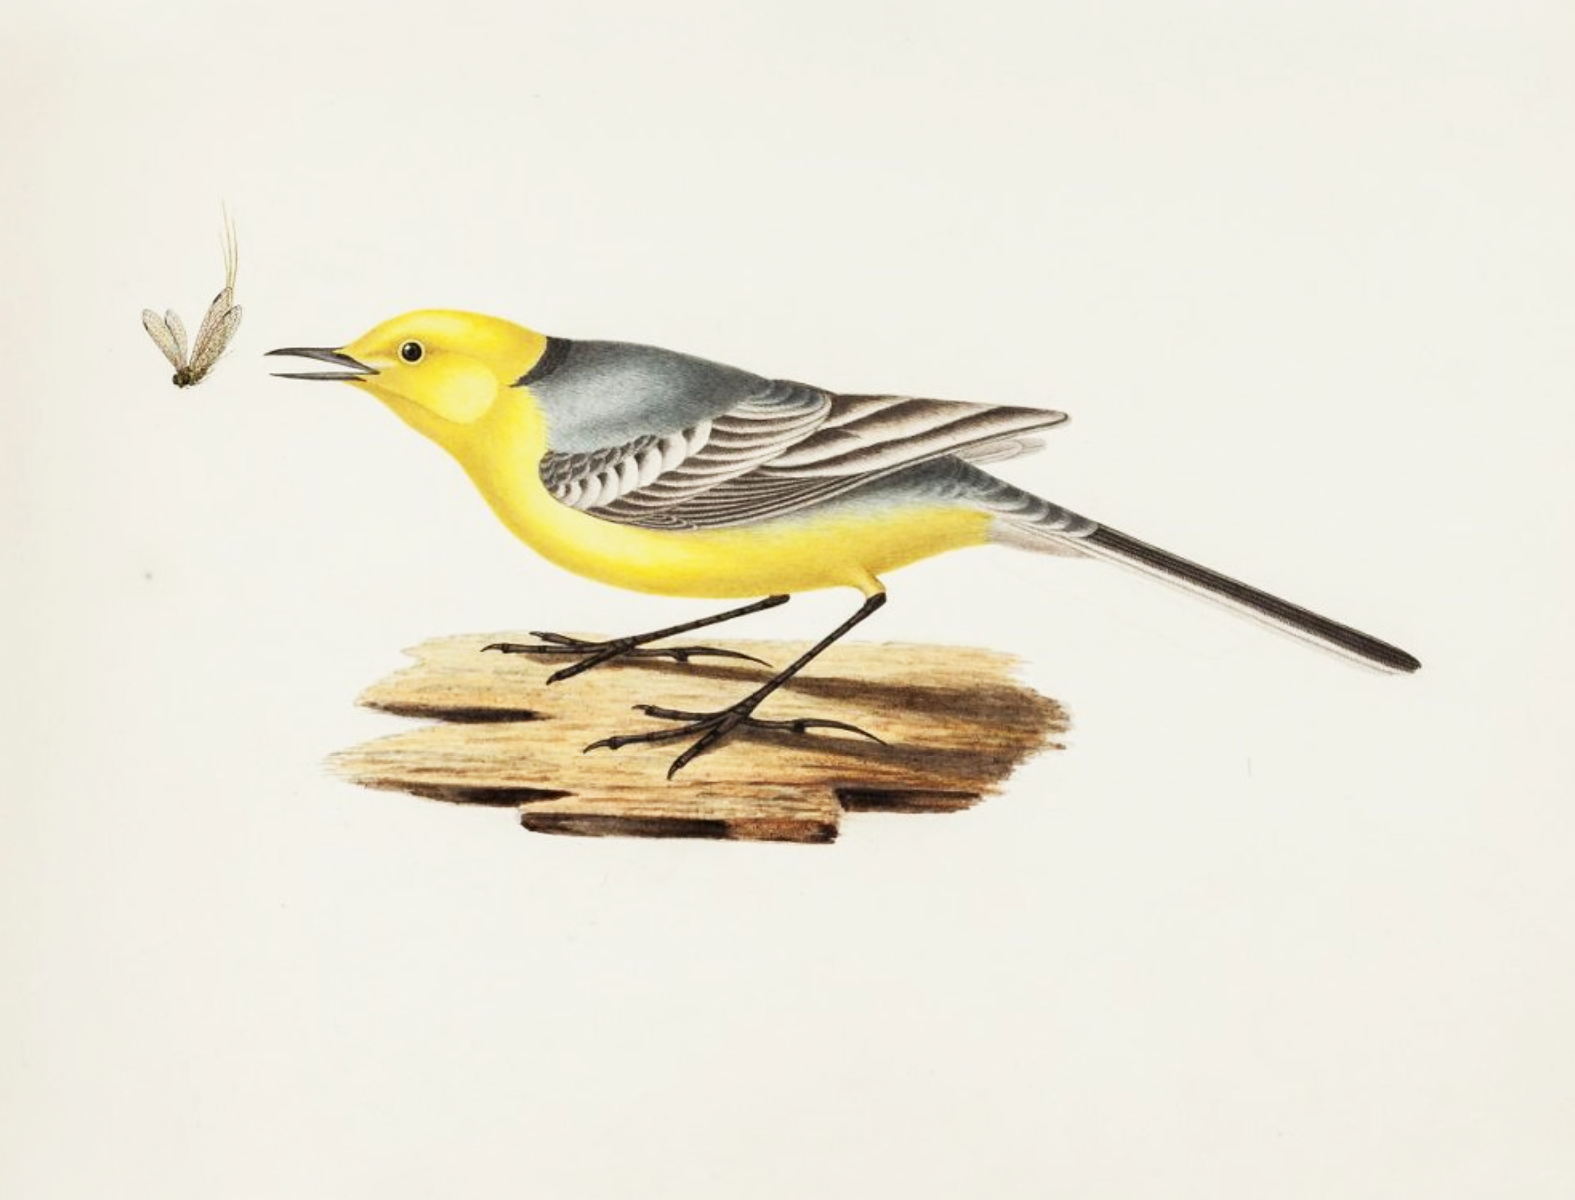 Желтая трясогузка. Лист из альбома «Птички» Борисов П. И. Начало 1840-х гг.